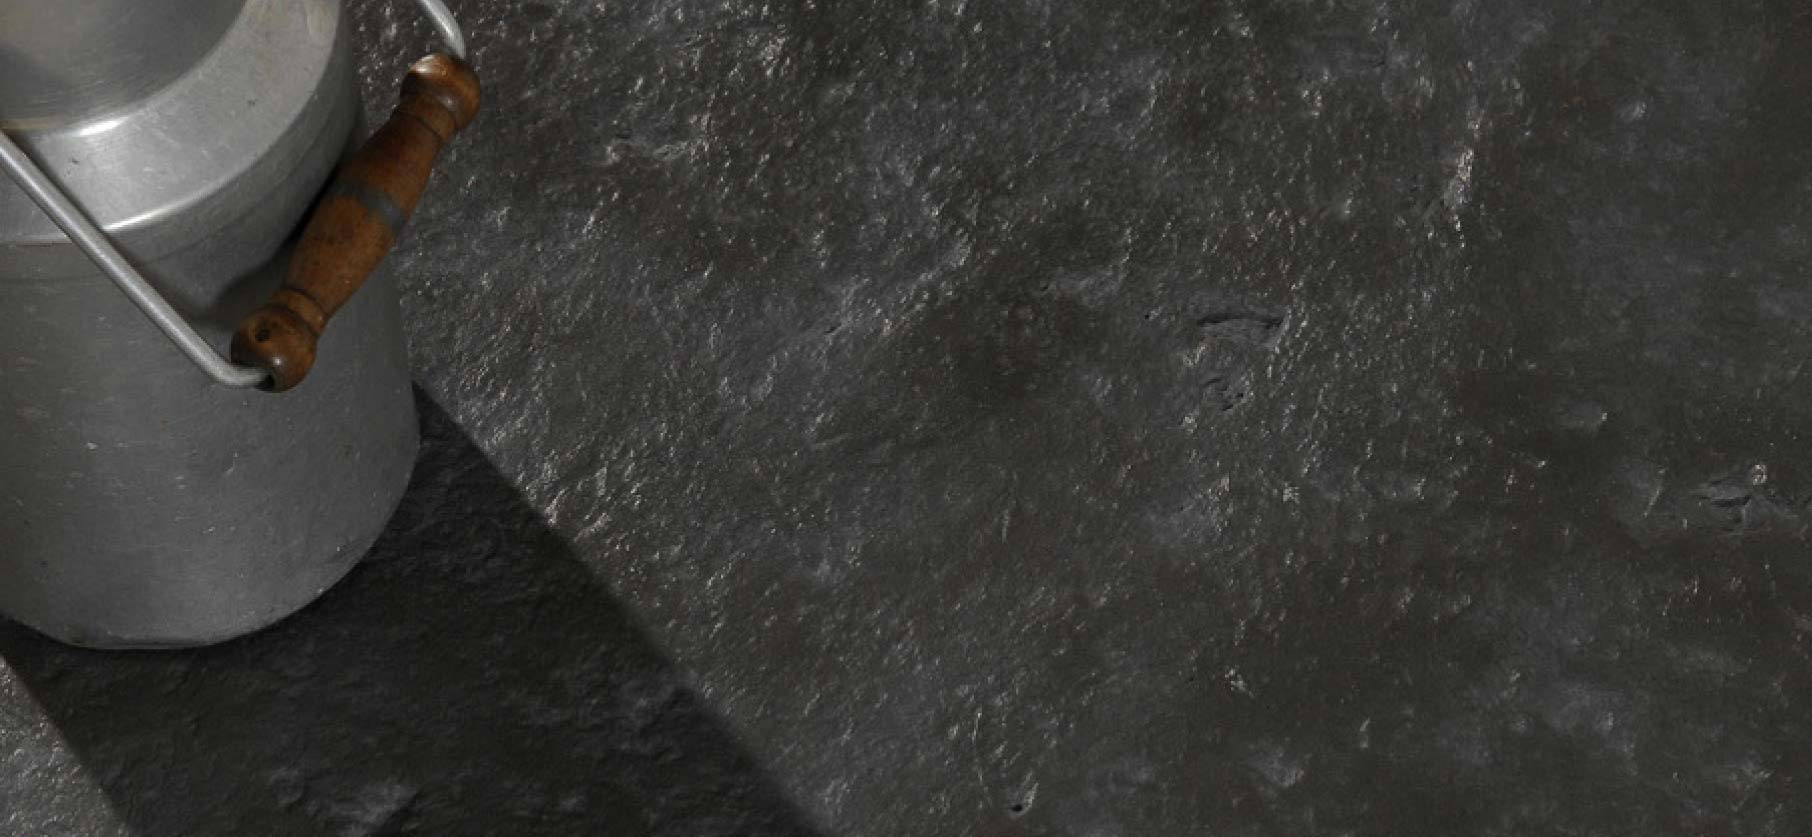 dallage et carrelage gris anthracite en b ton aspect ardoise. Black Bedroom Furniture Sets. Home Design Ideas